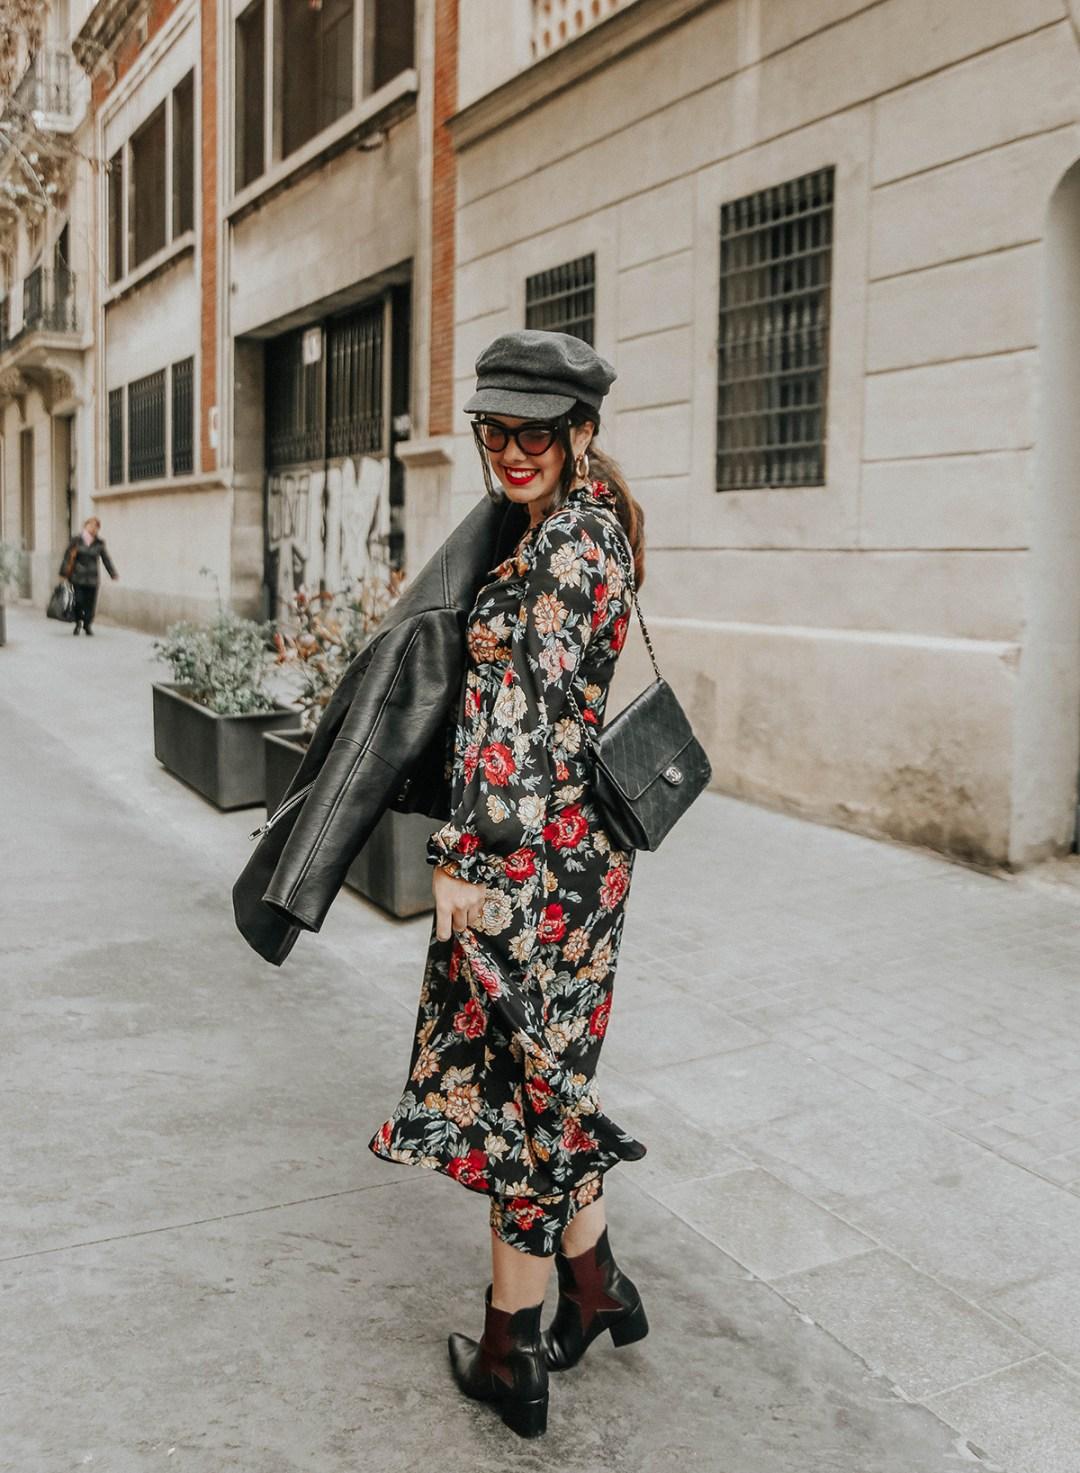 vestido-flores-midi-zara-botines-amazon-find-streetstyle